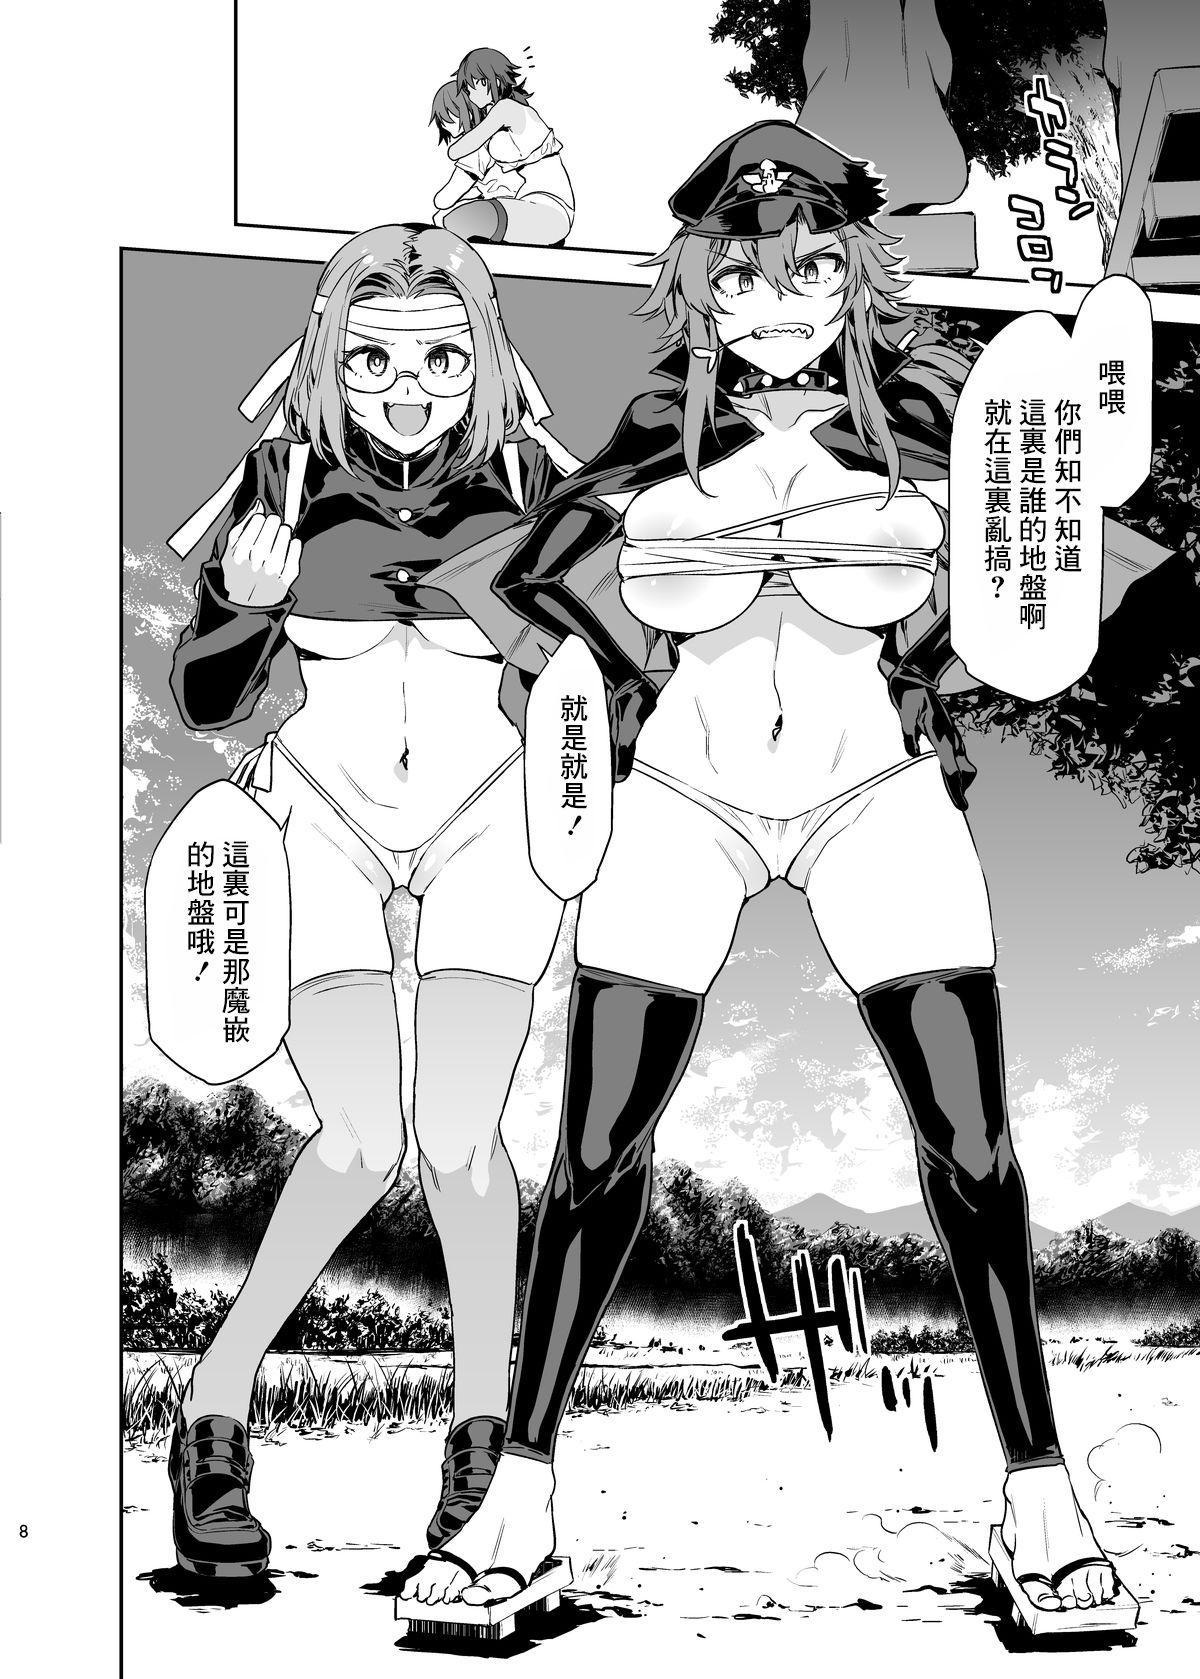 Teisou Kannen Zero no Onna Banchou 7